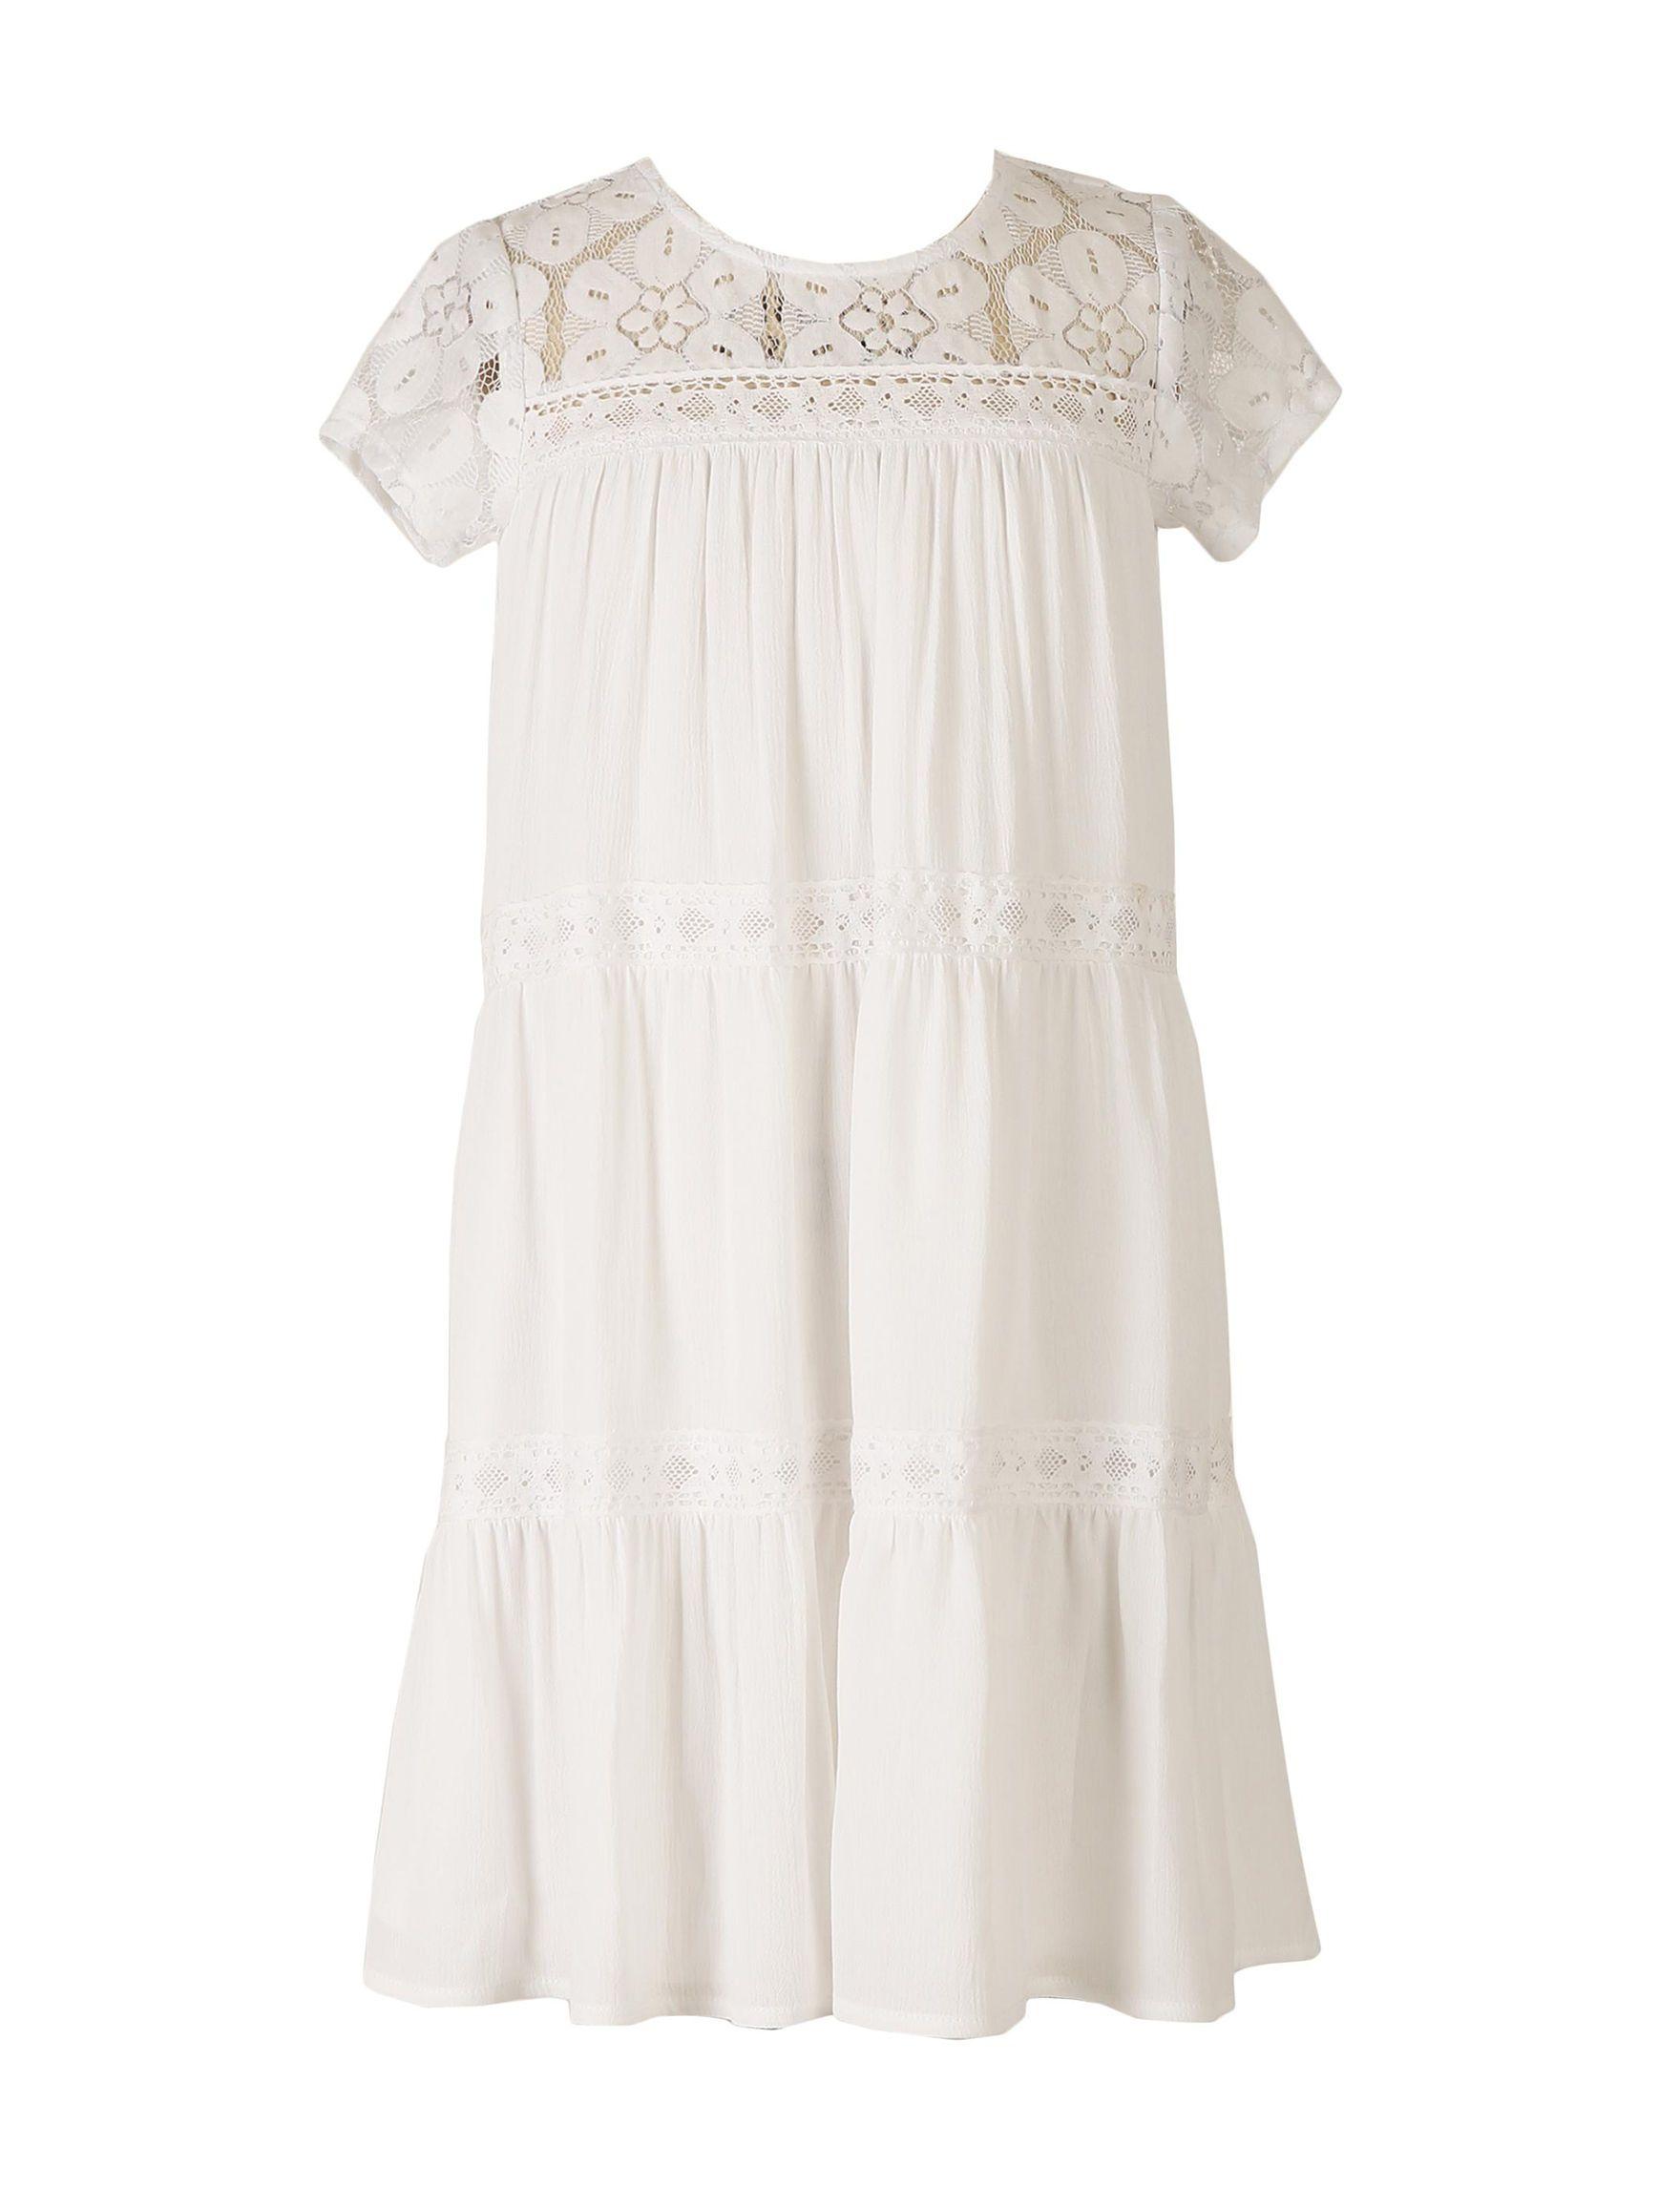 Tiered Gauze Dresses